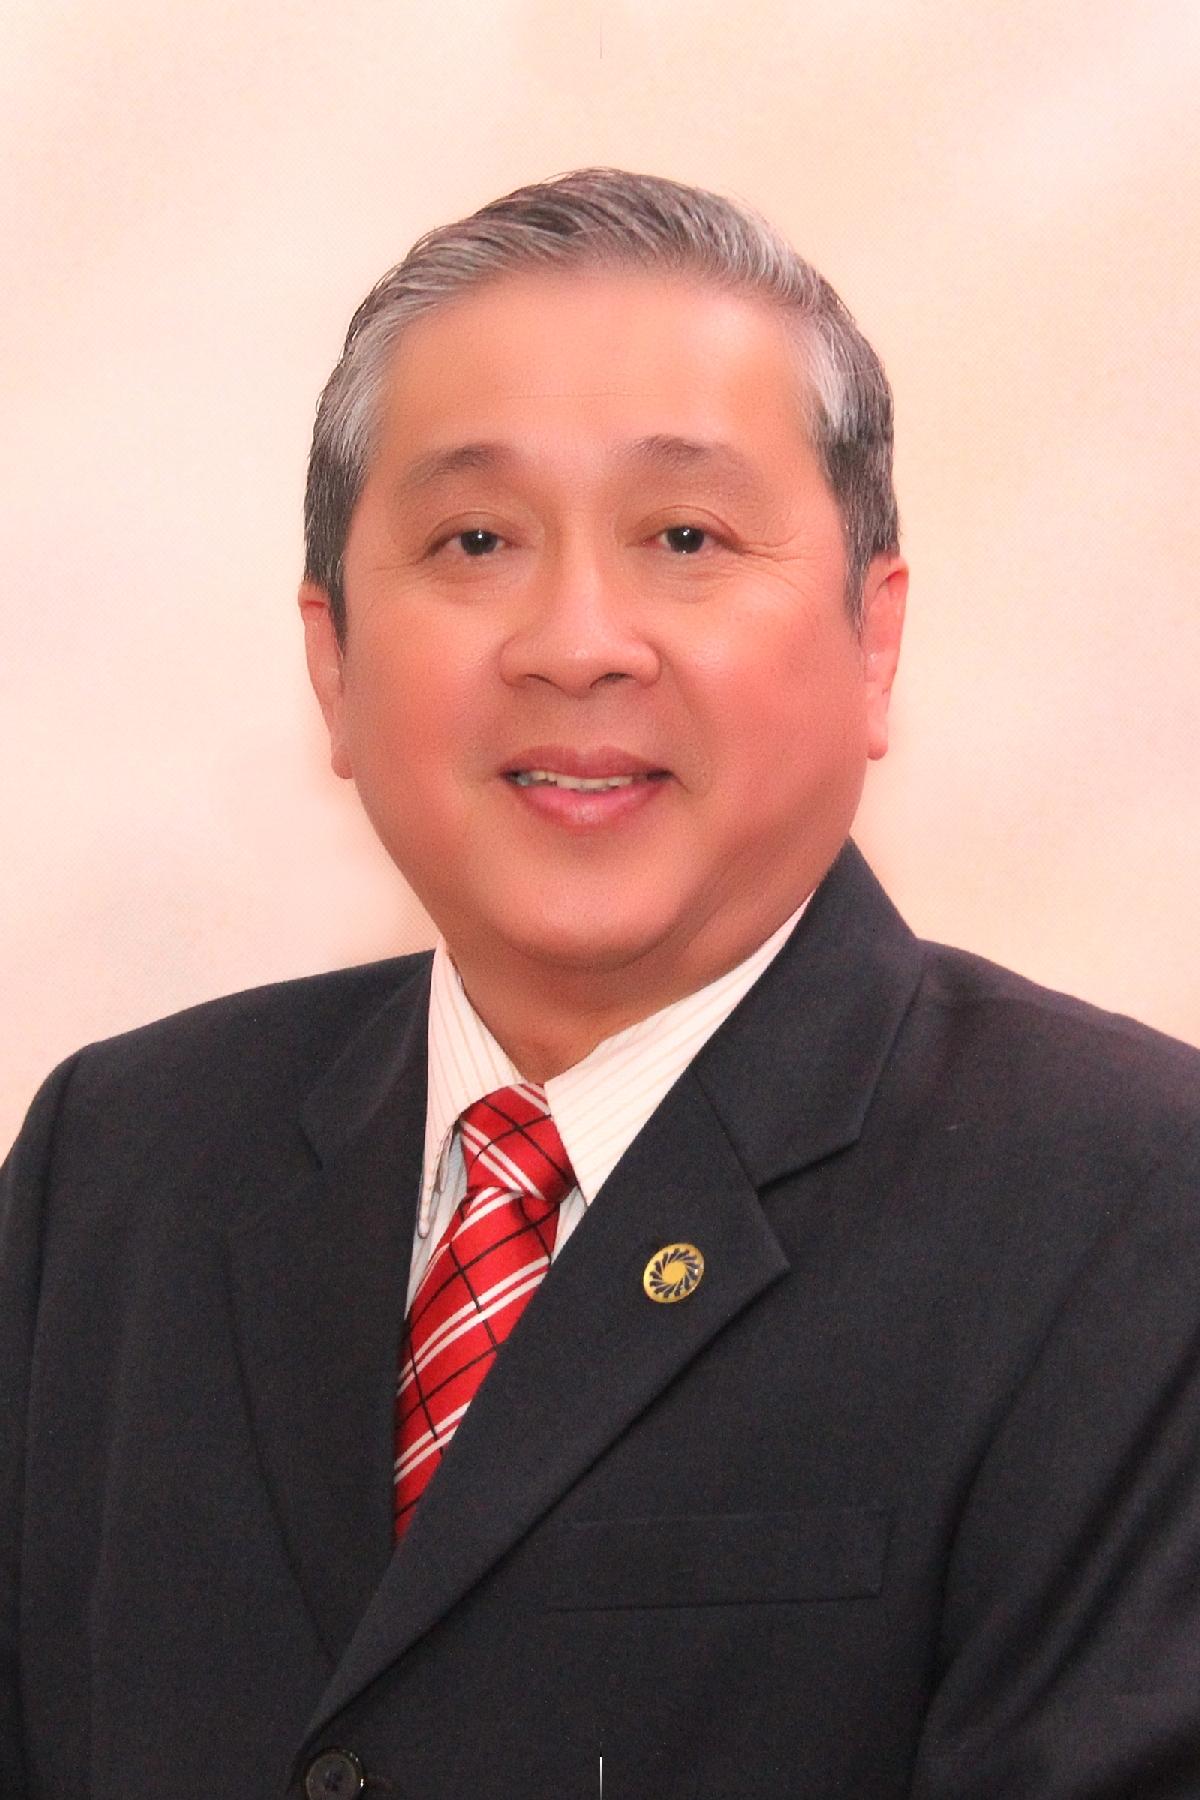 <h80>林明水</h80><br>Lam Ming Swee